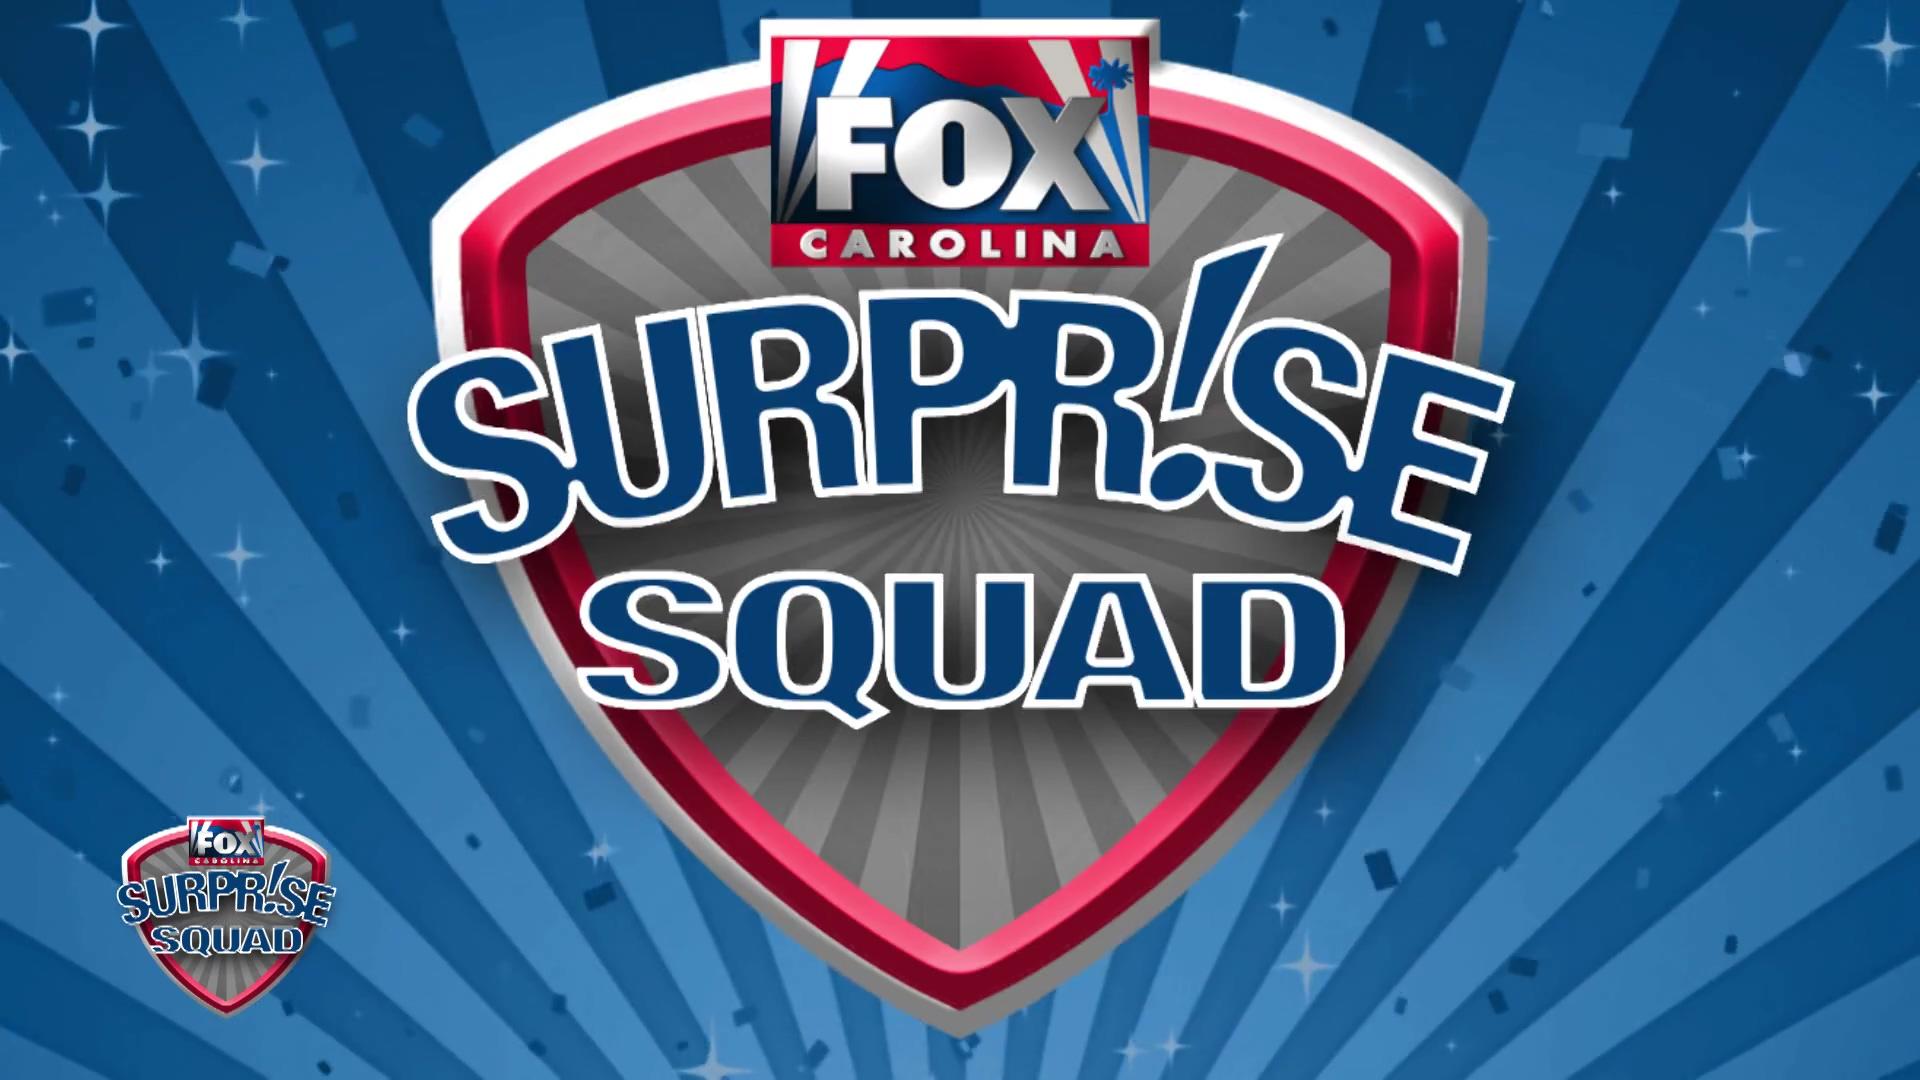 FOX Carolina Surprise Squad_February 2021